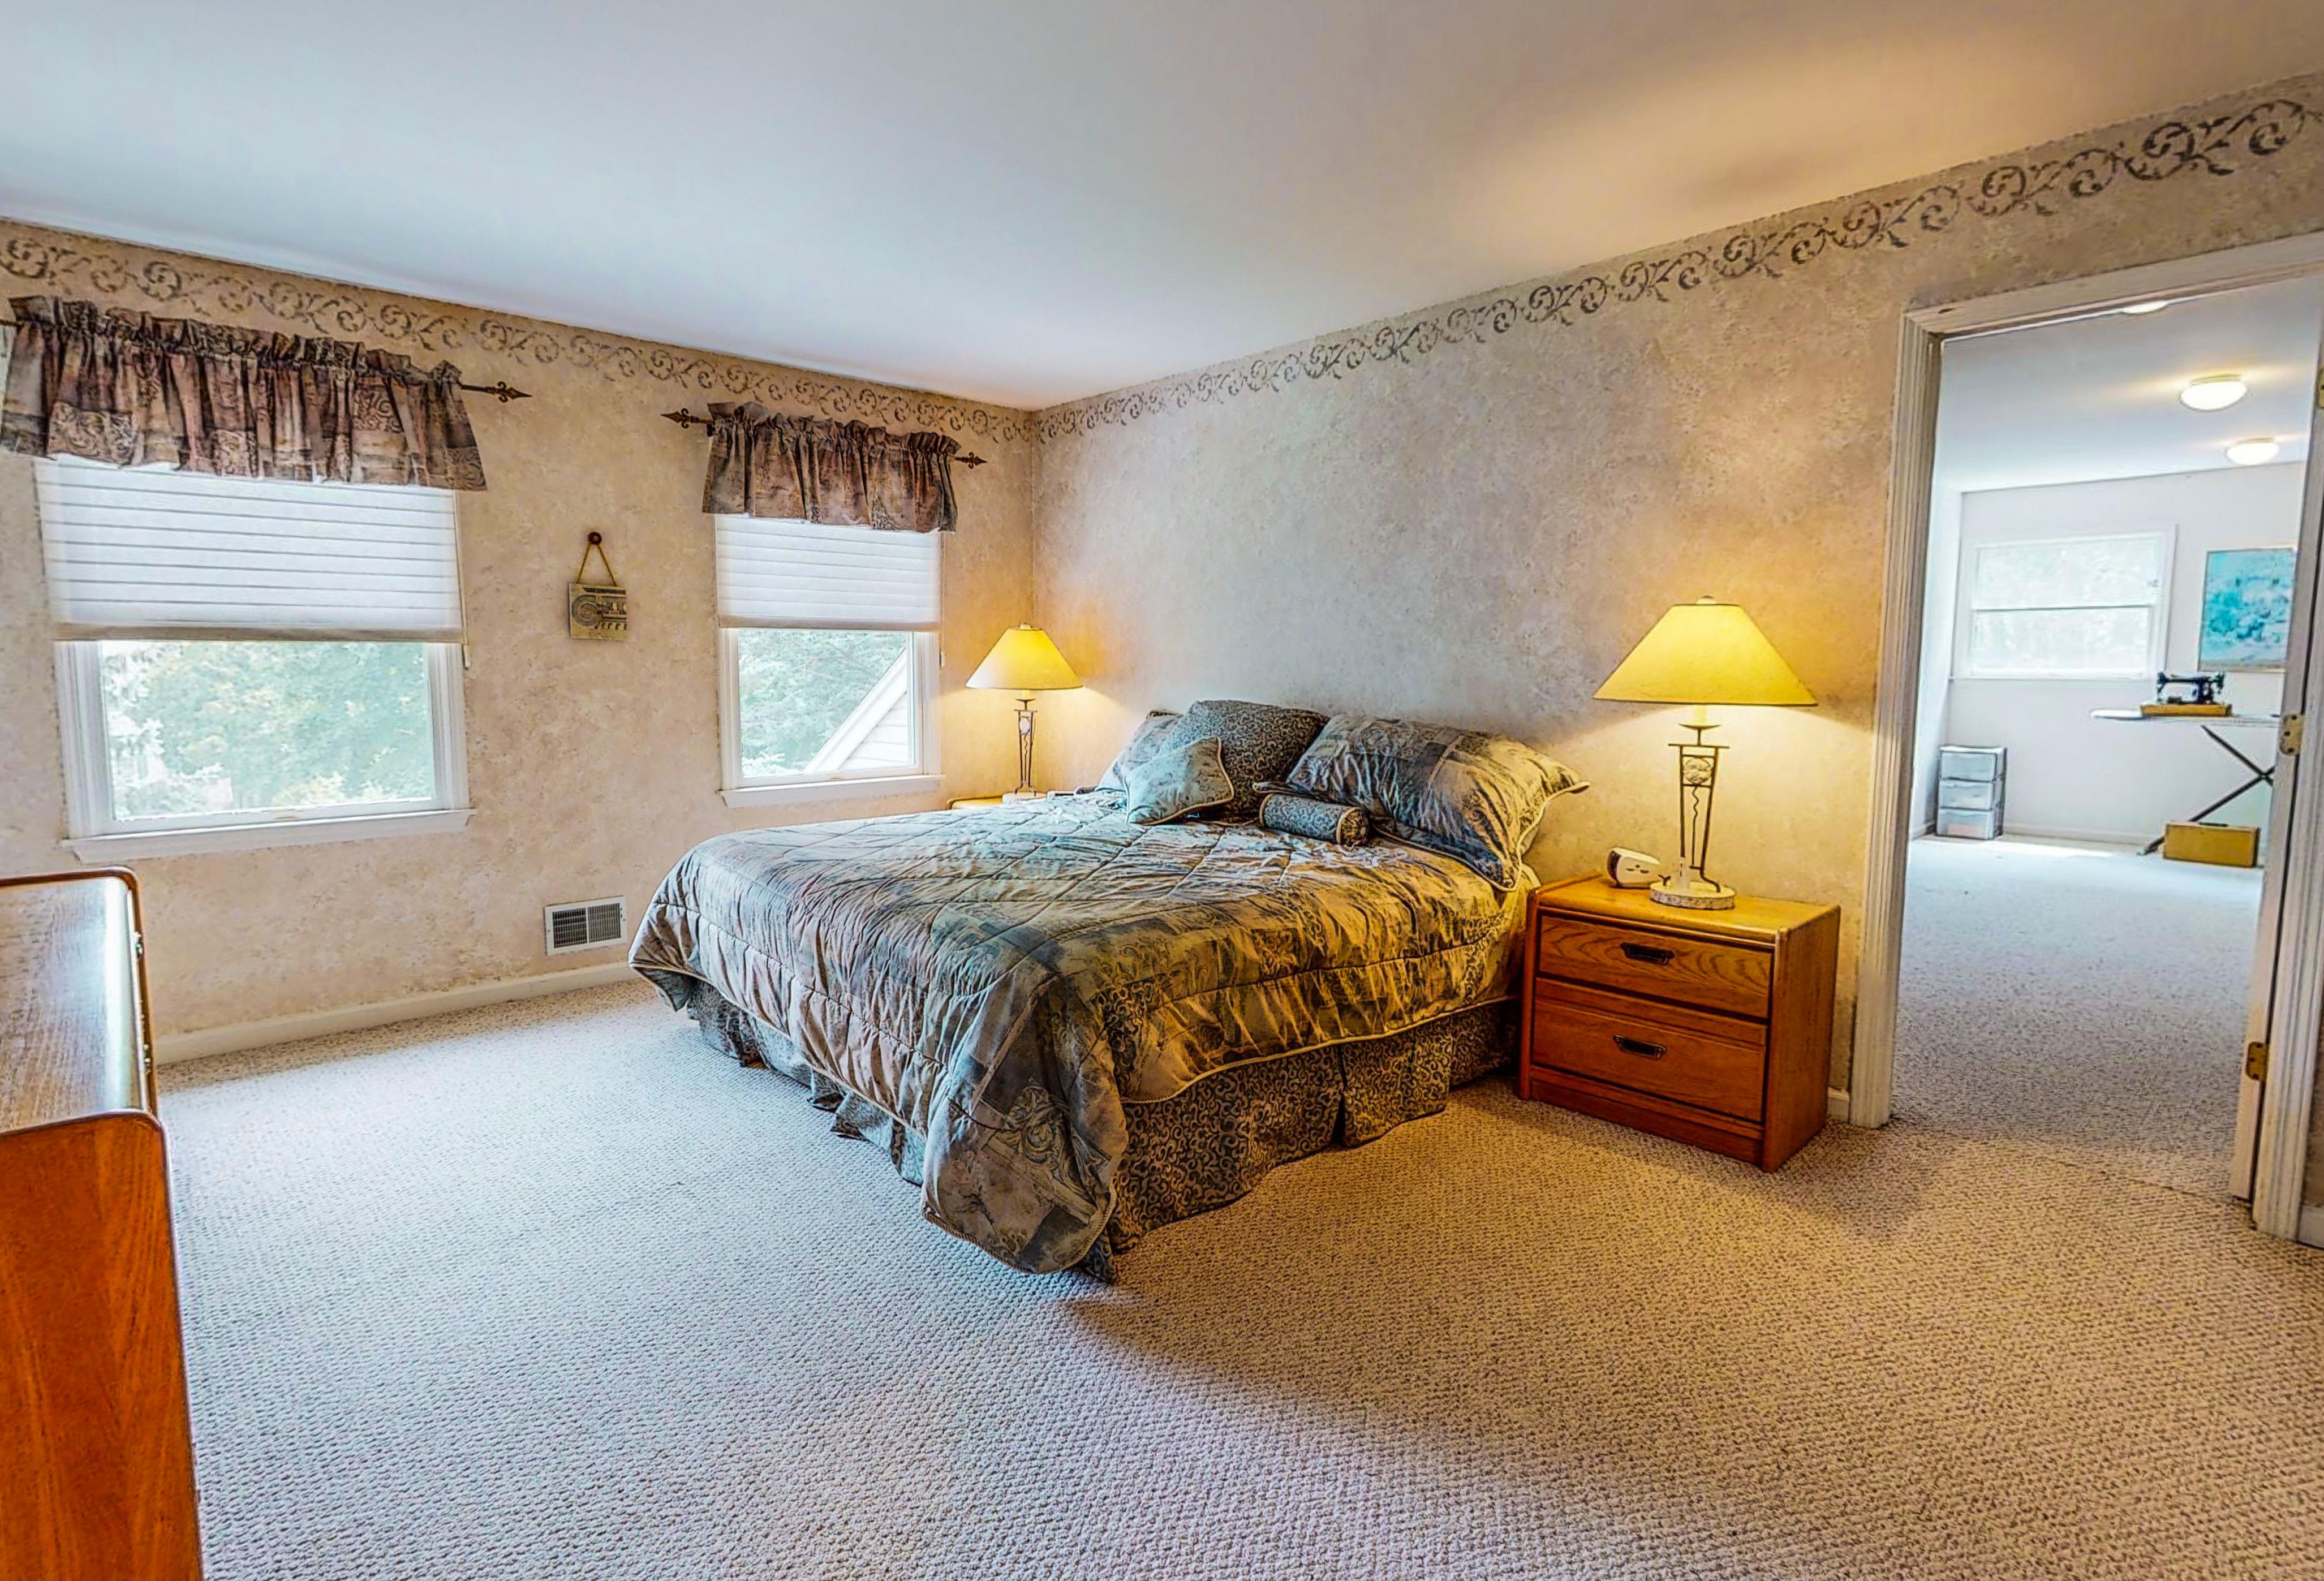 Primary Suite 5 Sleepy Hollow Dr Oak Ridge NJ